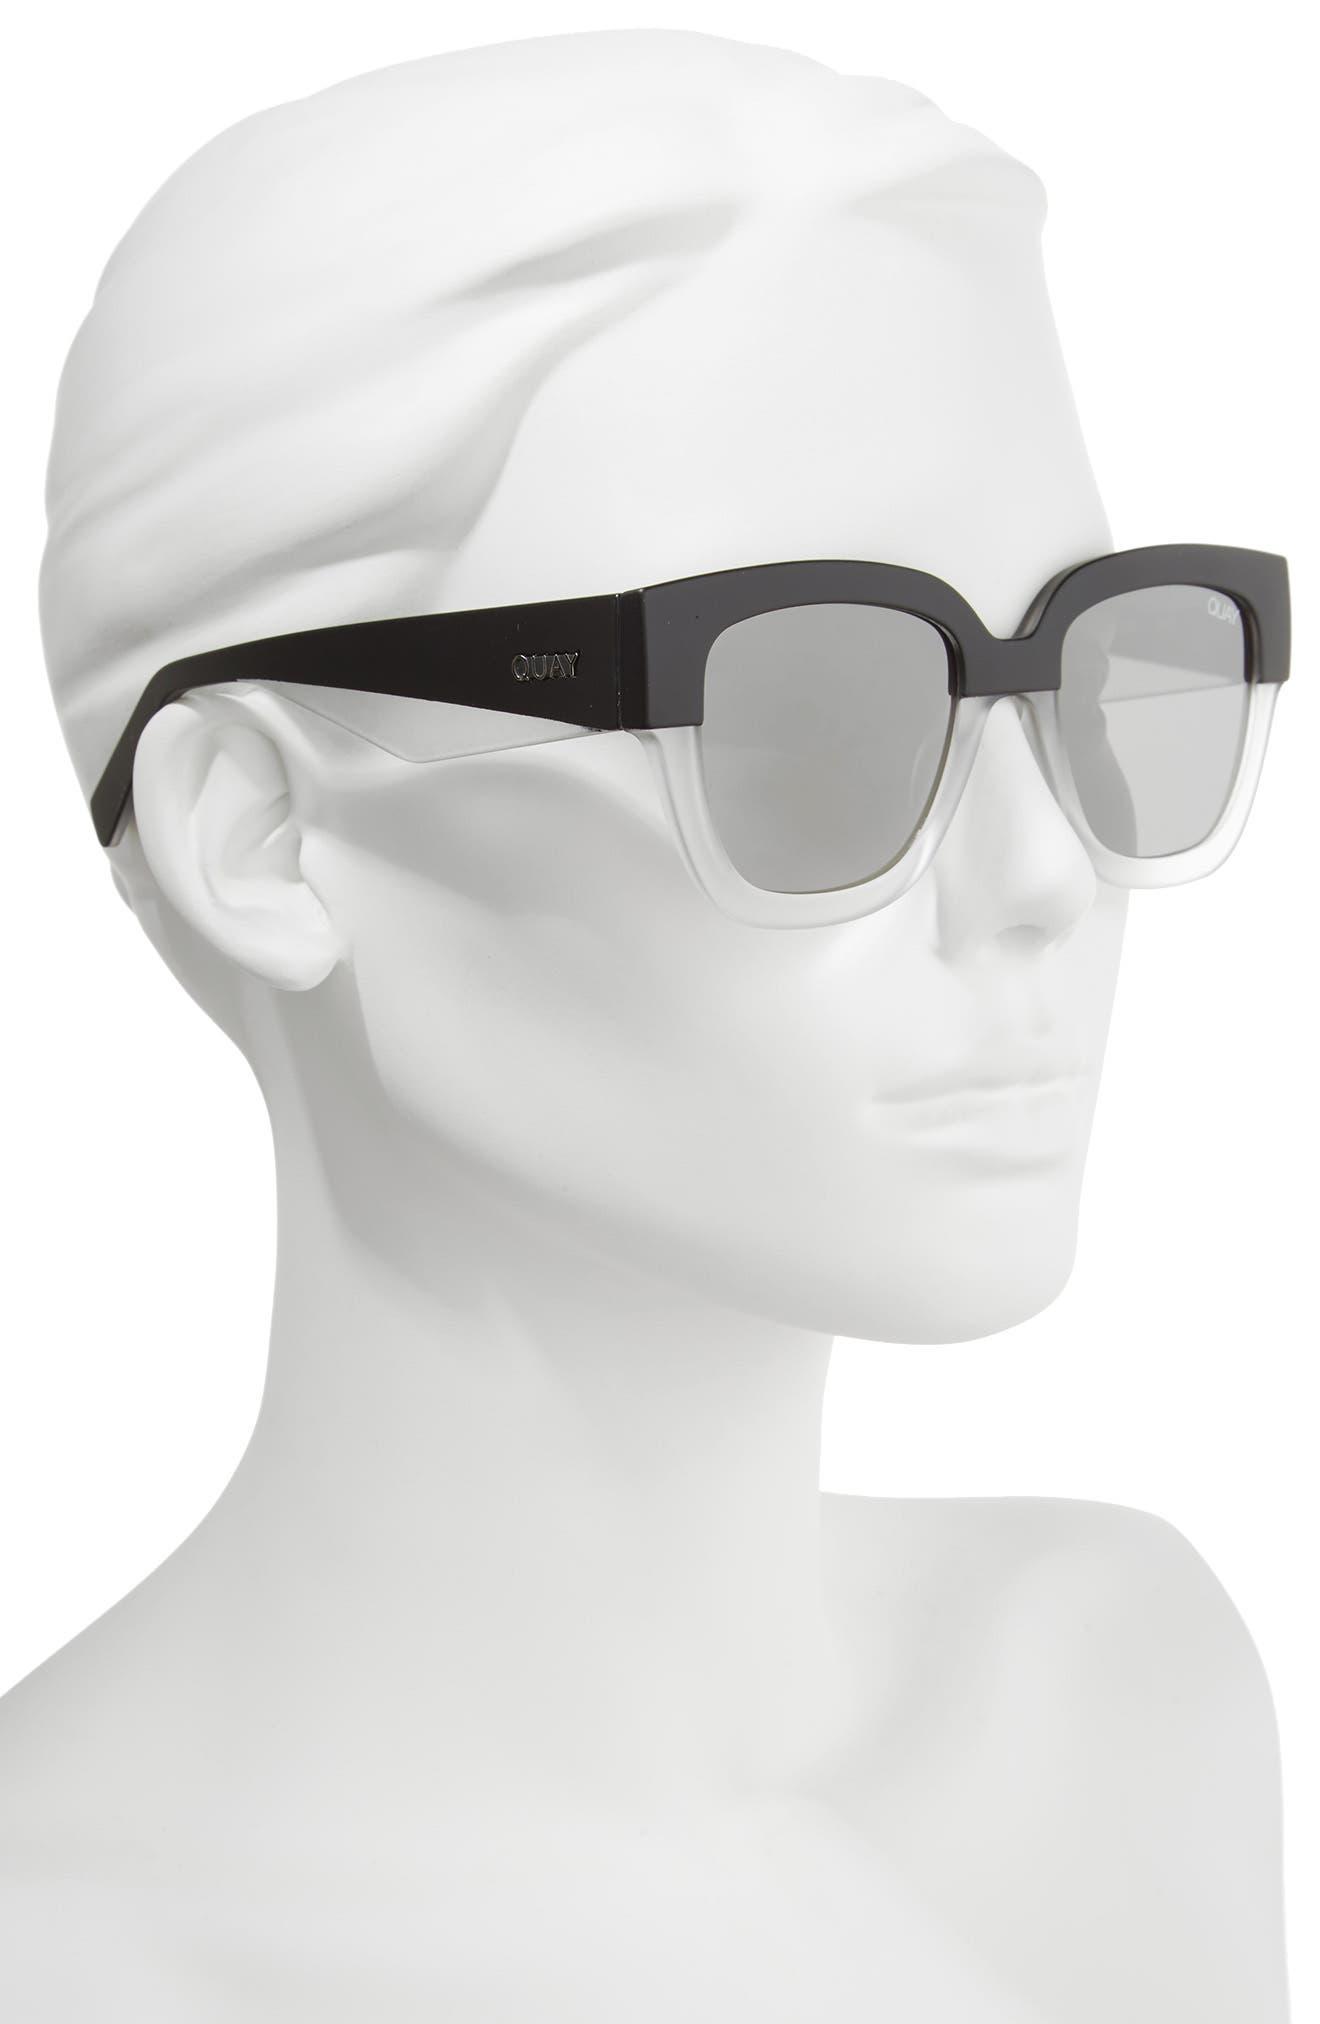 55mm Don't Stop Sunglasses,                             Alternate thumbnail 3, color,